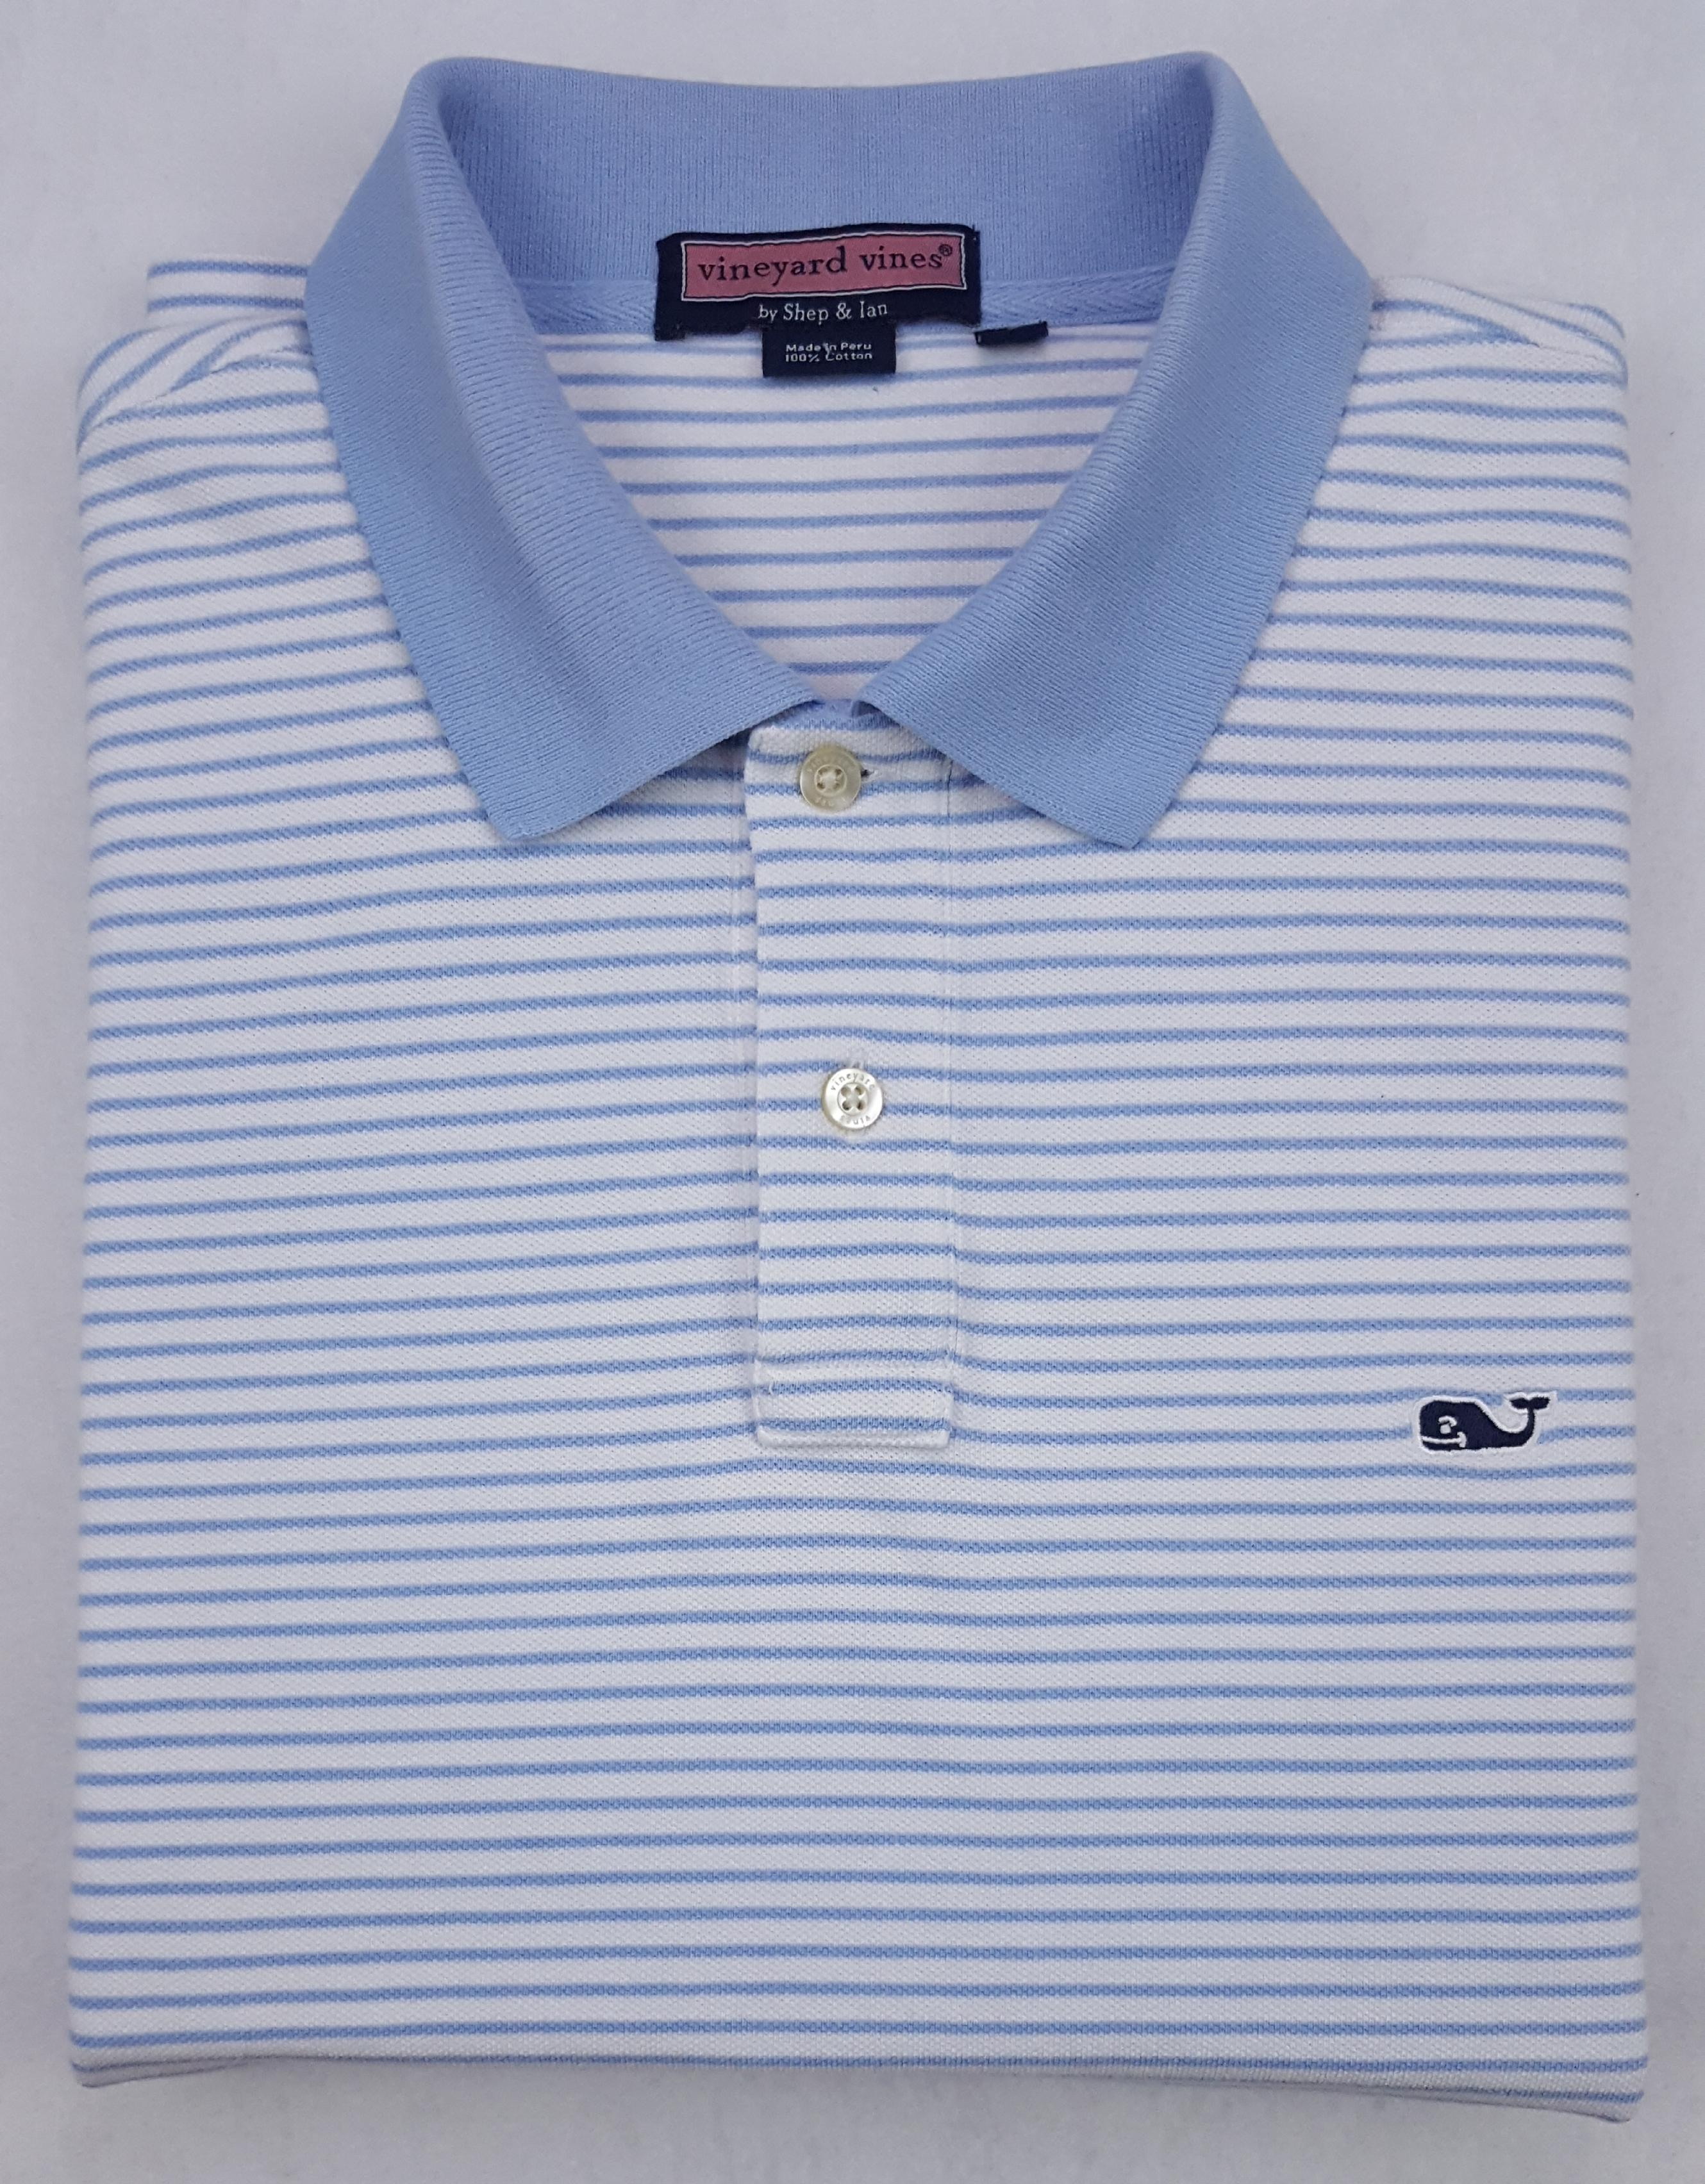 Vineyard Vines Vineyard Vines Whale Polo Shirt Large Striped Blue